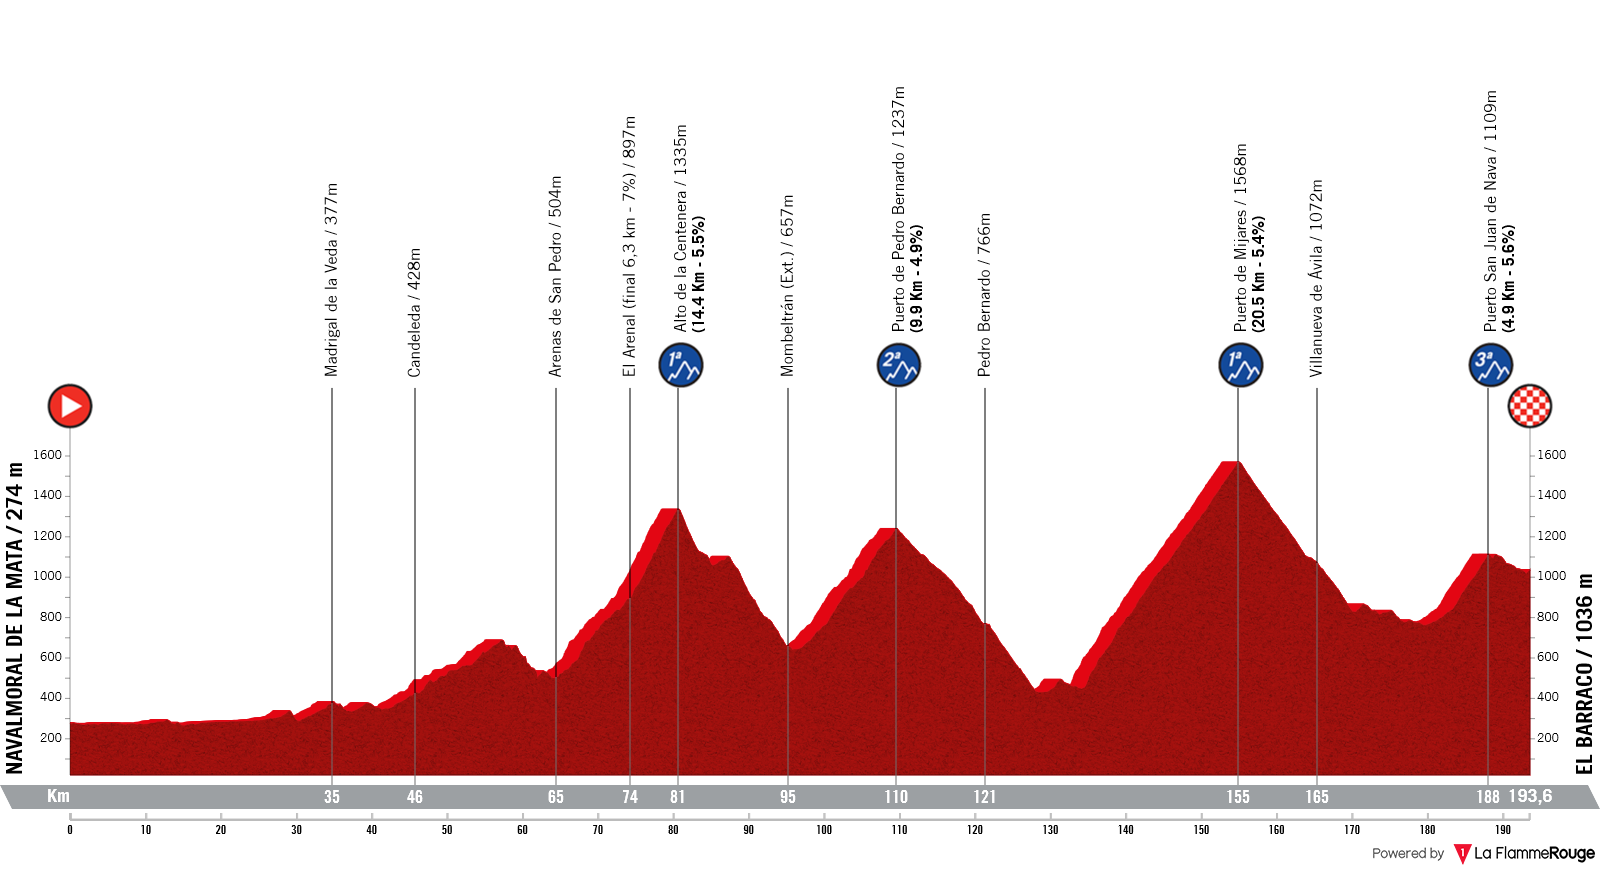 Etapa 15 - Vuelta España 2021 - Navalmoral de la Mata El Barraco